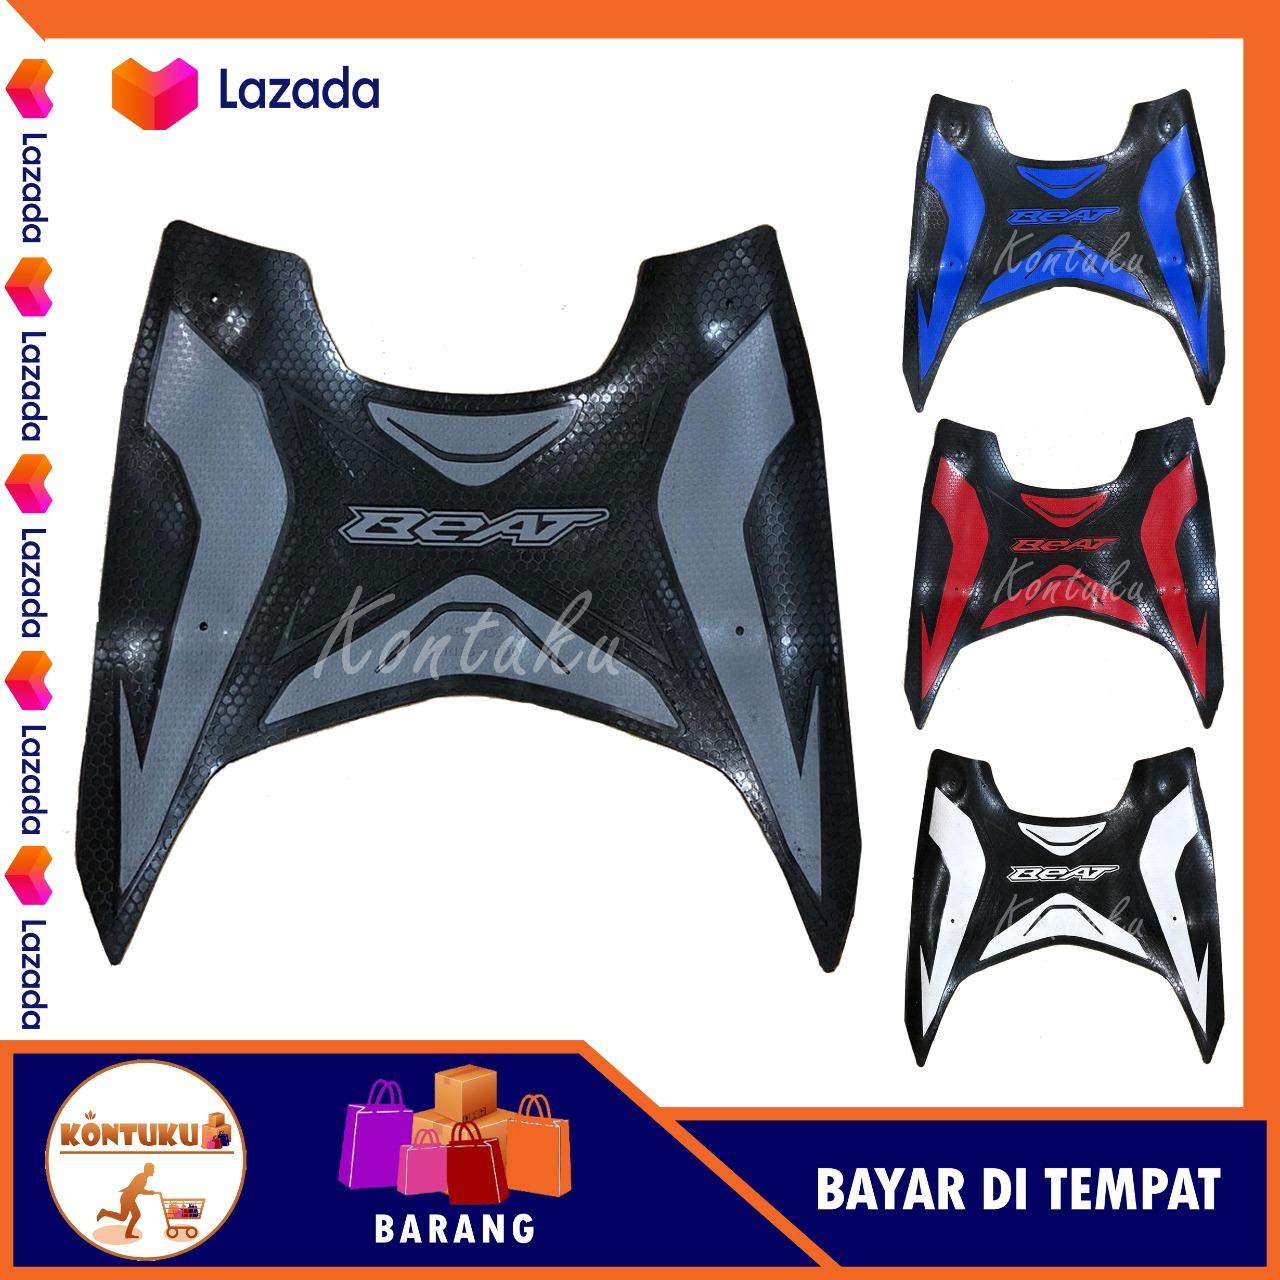 Karpet Motor Beat New 2020 Karpet Beat Terbaru 2020 Beat Deluxe Beat Street Cbs Iss 2020 Silver Abu Abu Lazada Indonesia